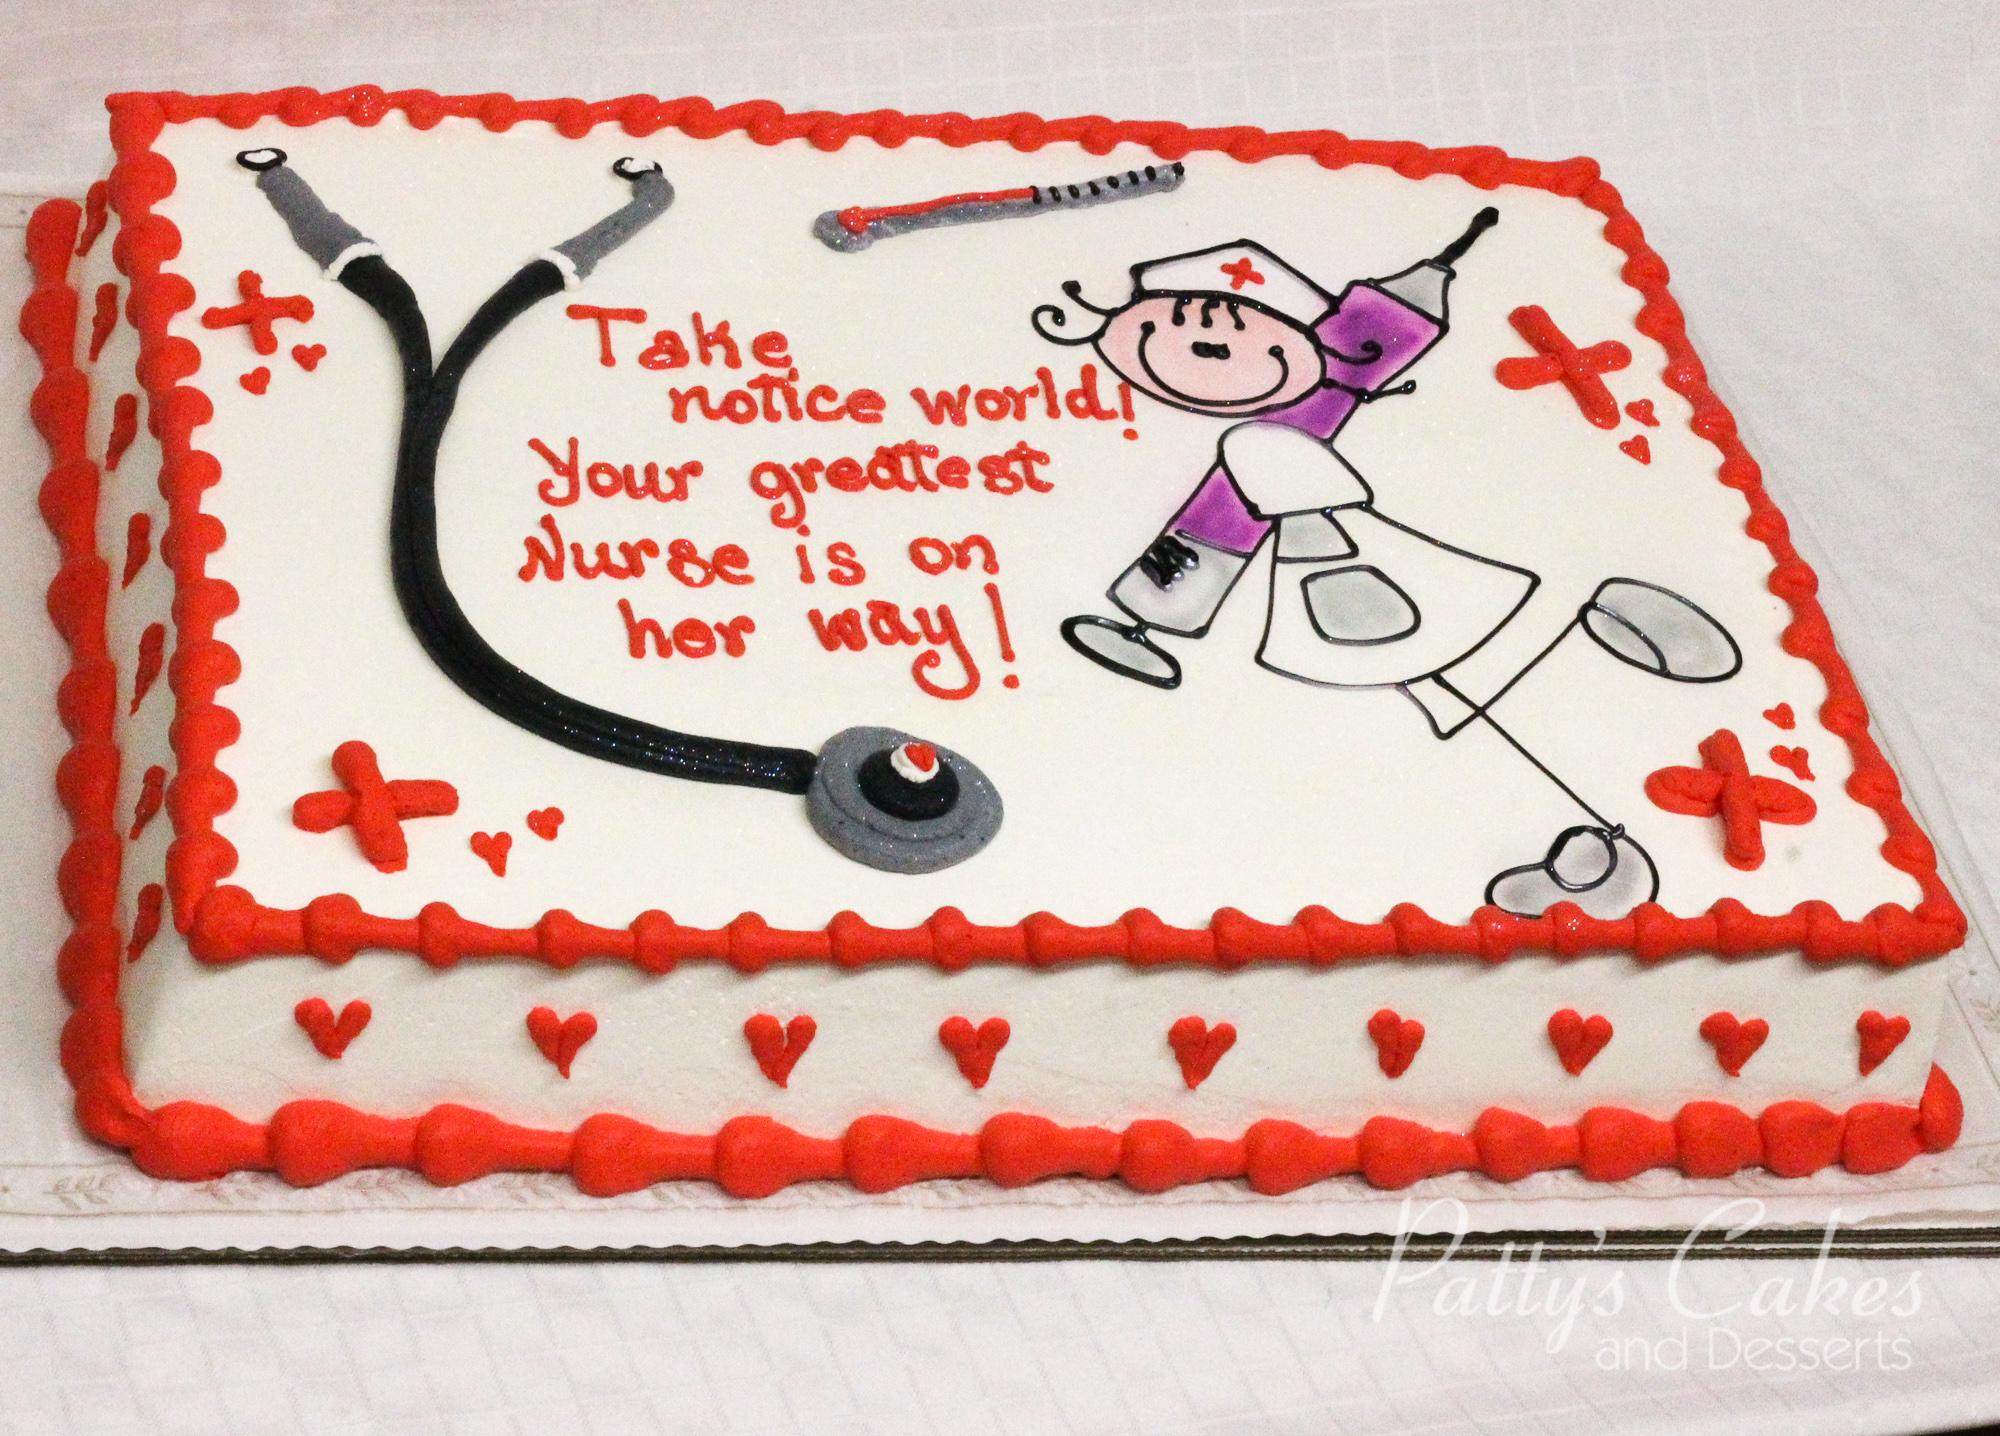 Graduation Sheet Cakes Photo of a nurse gradu...